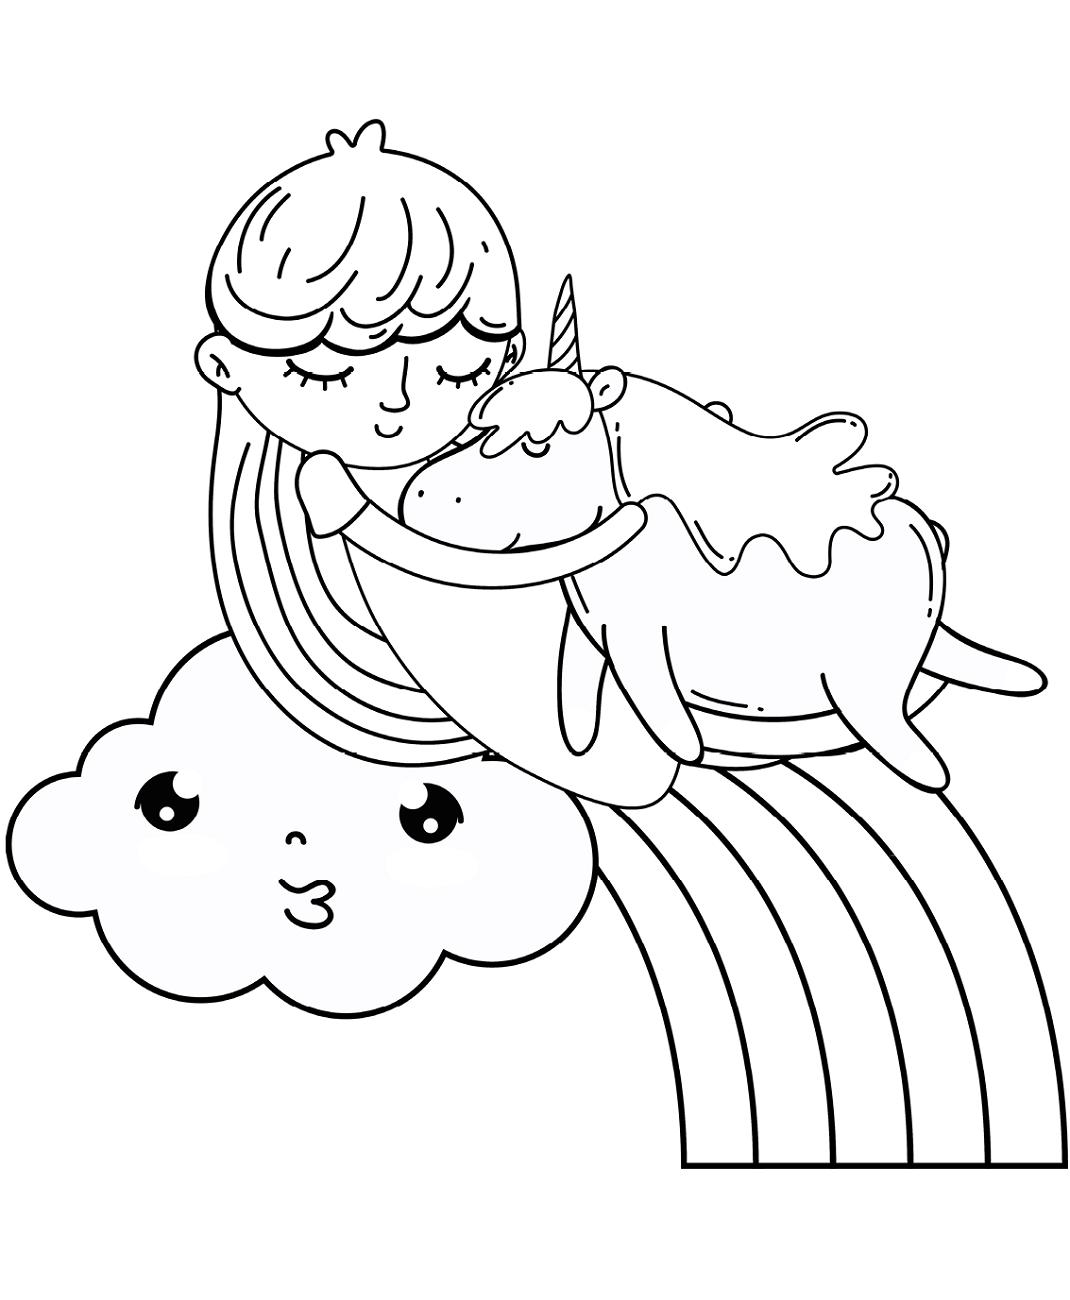 Unicorn Coloring Pages | Raising Smart Girls | 1300x1070